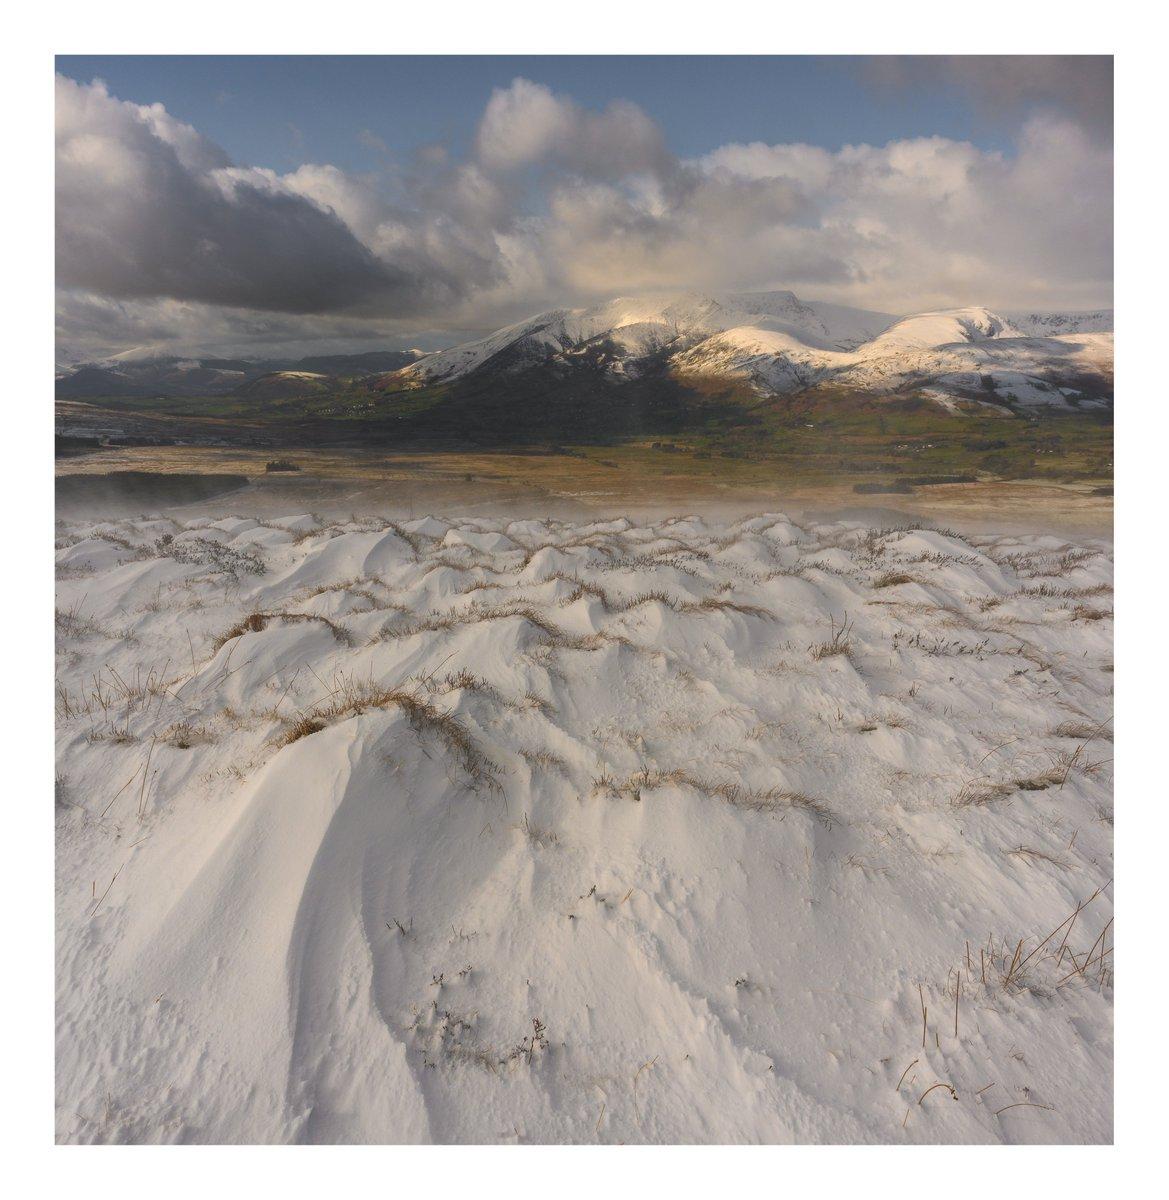 great mell fell views   nikon z7 nikon 24-70mm f4   3leggedthing winston   #LakeDistrict #landscapes  #cumbriaroadspic.twitter.com/O3ixYm4Swp